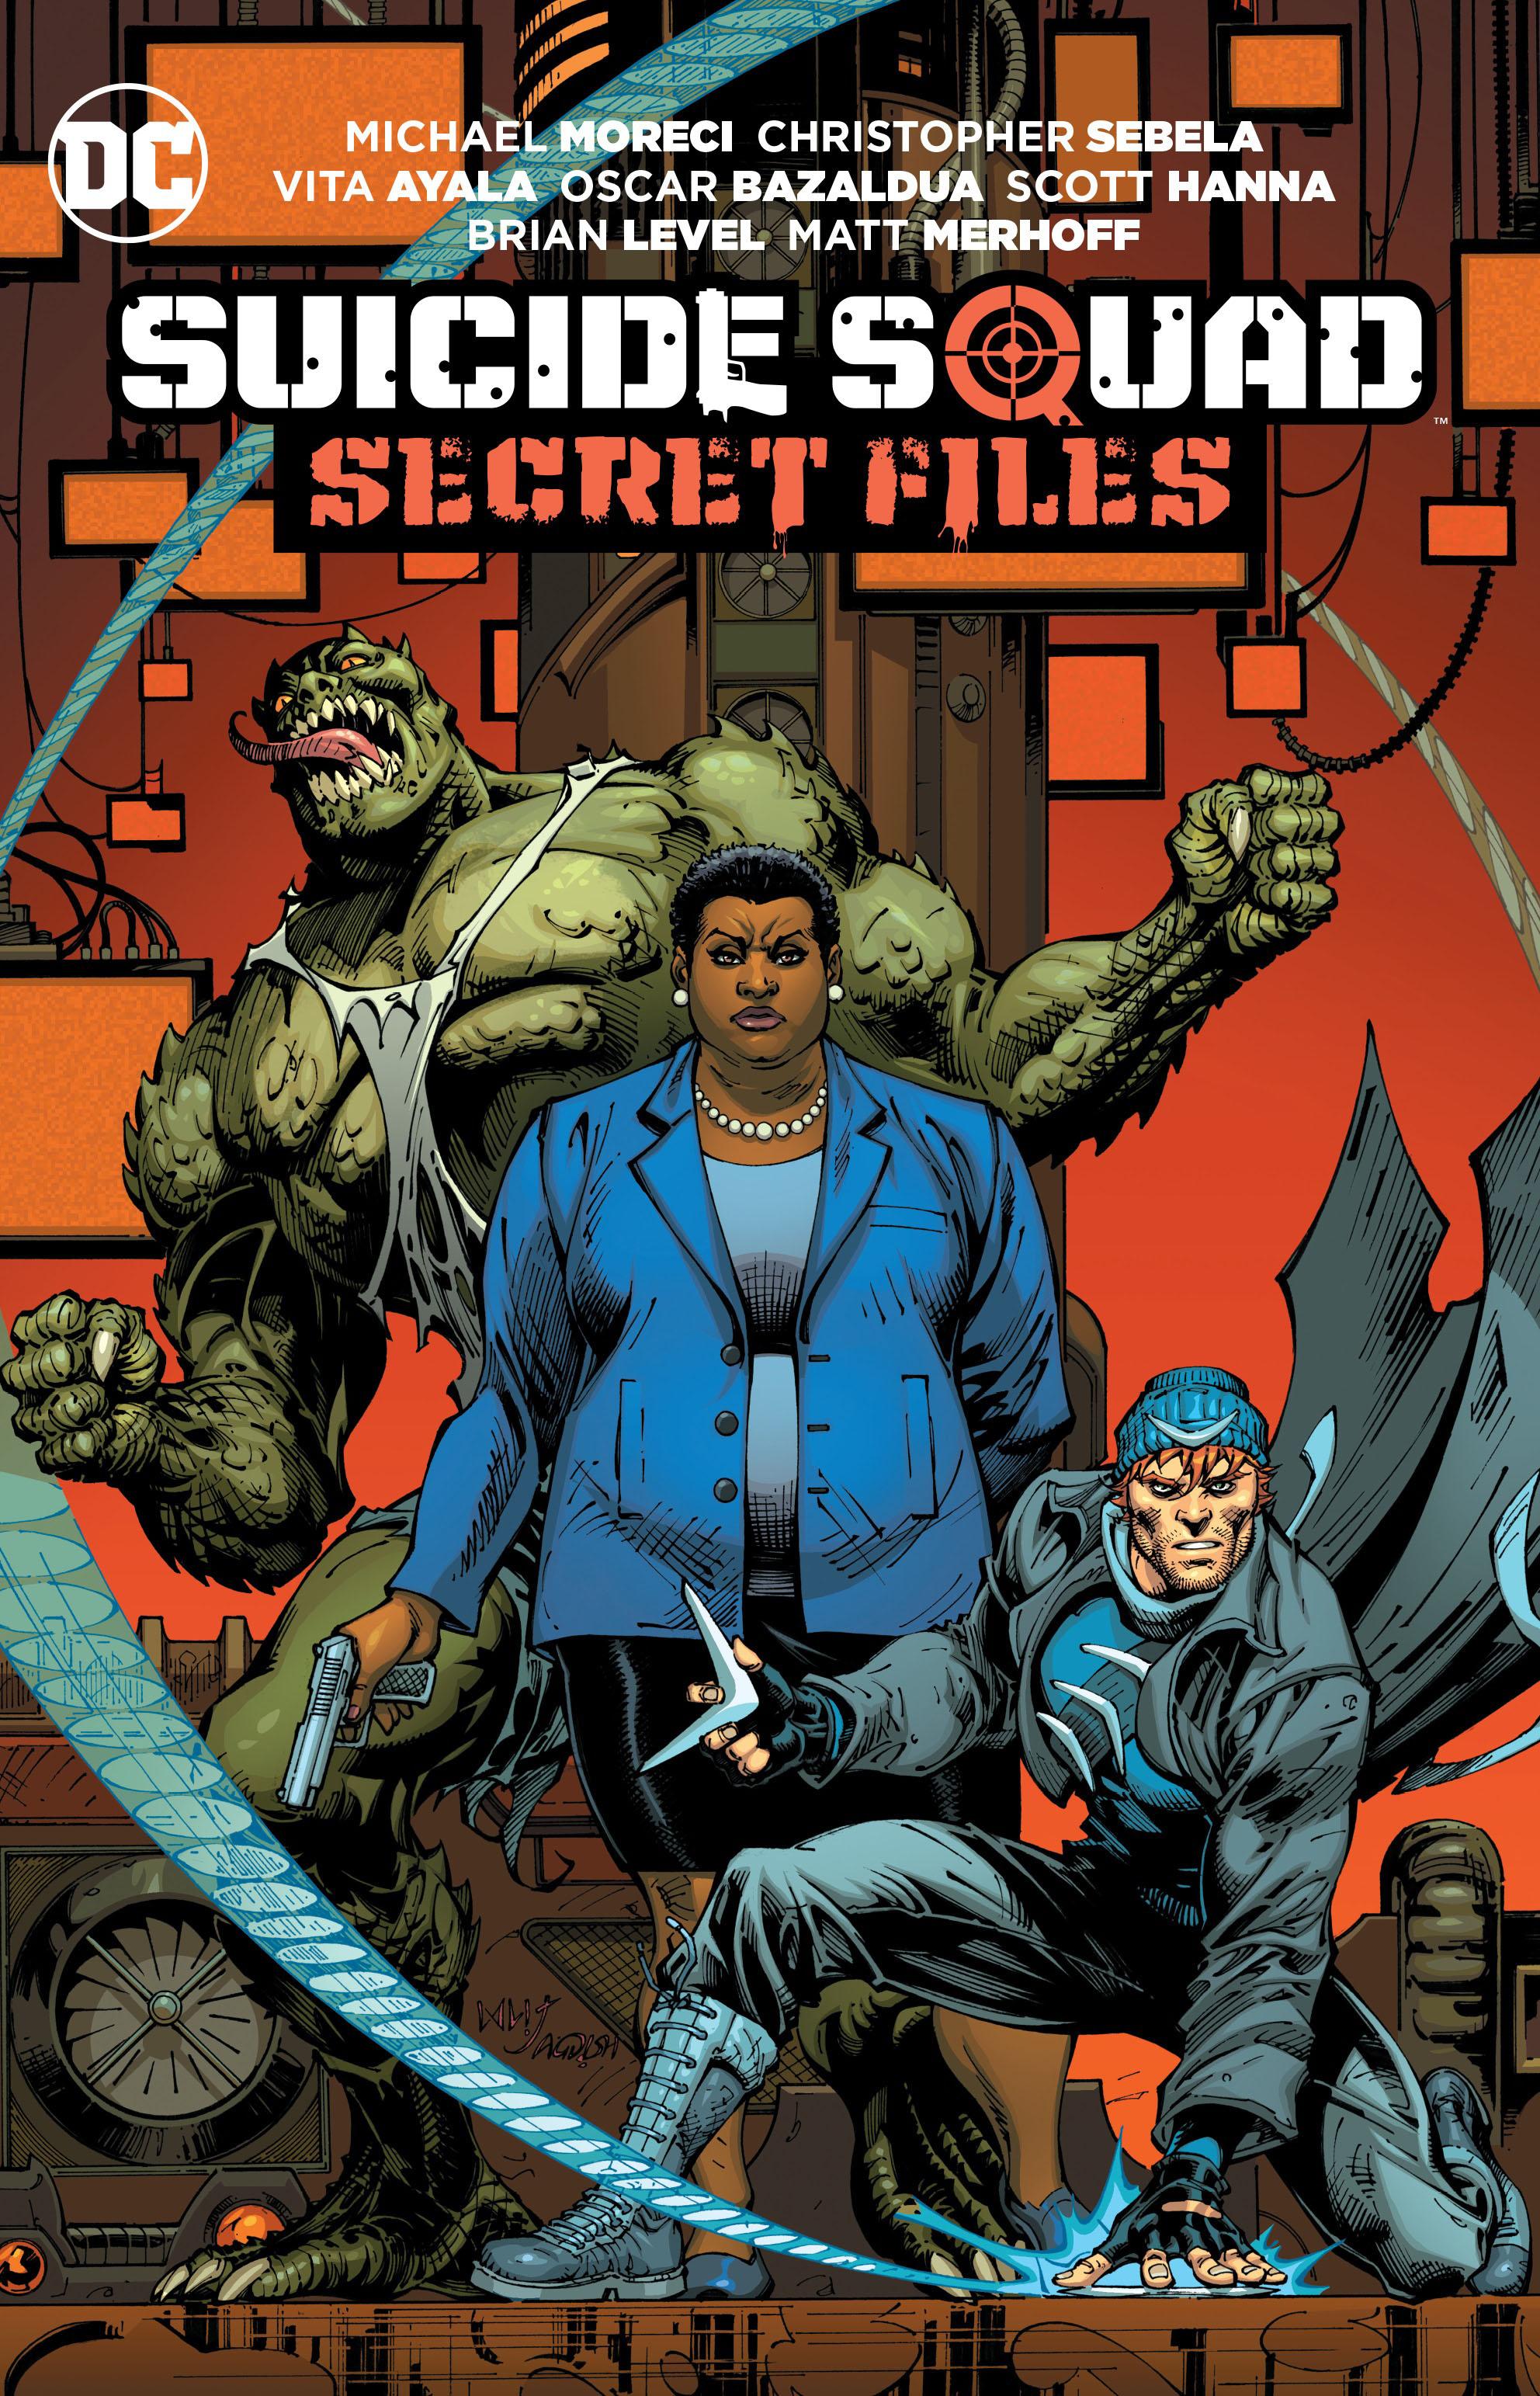 Suicide Squad: Secret Files suicide squad vol 3 burning down the house rebirth